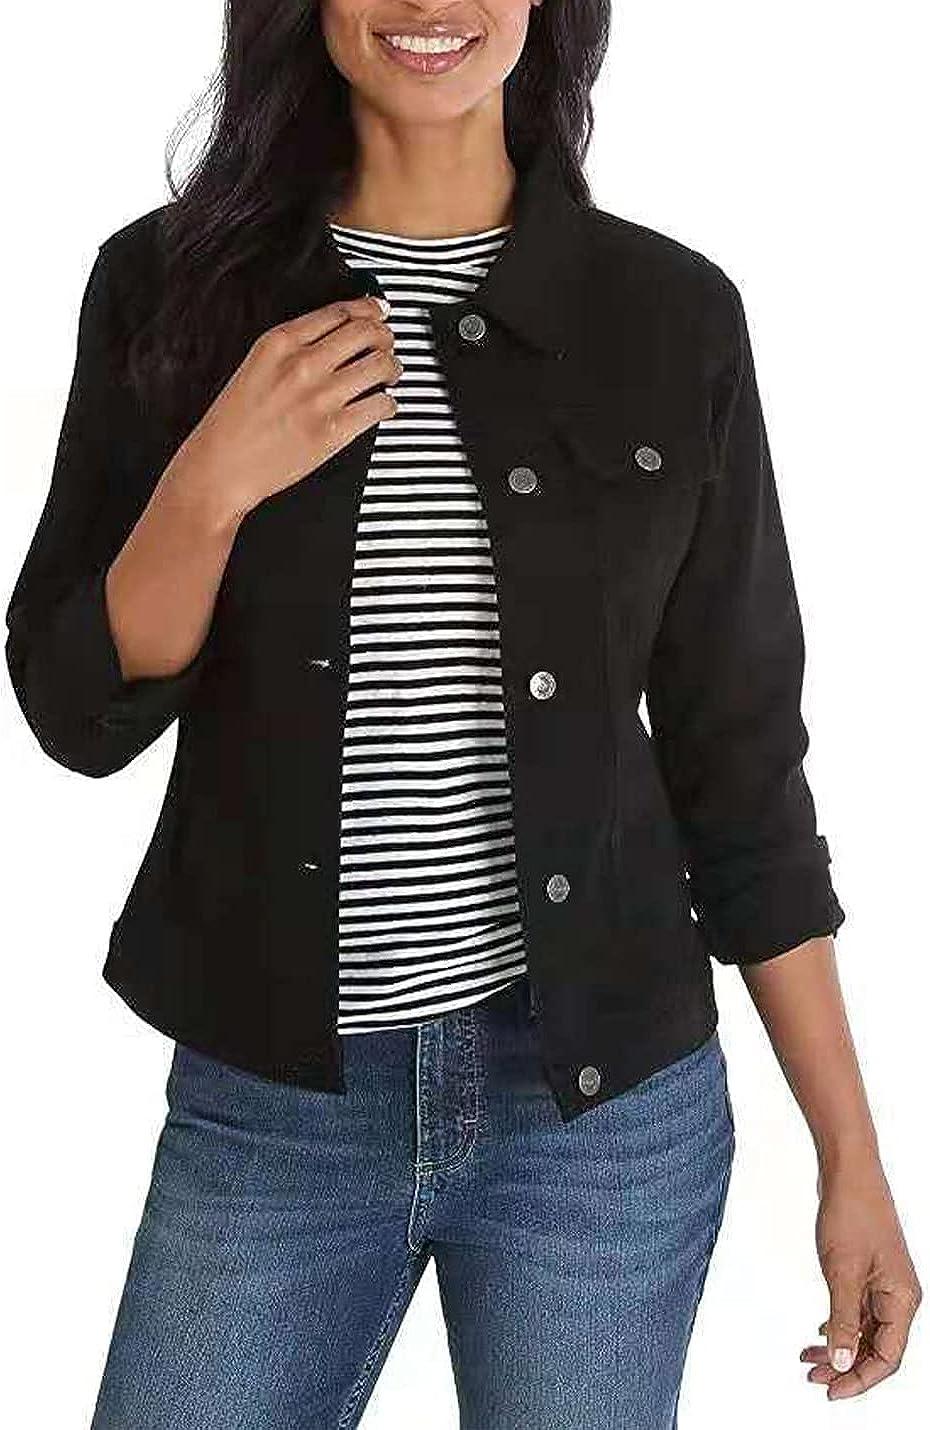 Peacwglad Women's Solid Color Long-Sleeved Single-Breasted Denim Jacket Slim Jacket